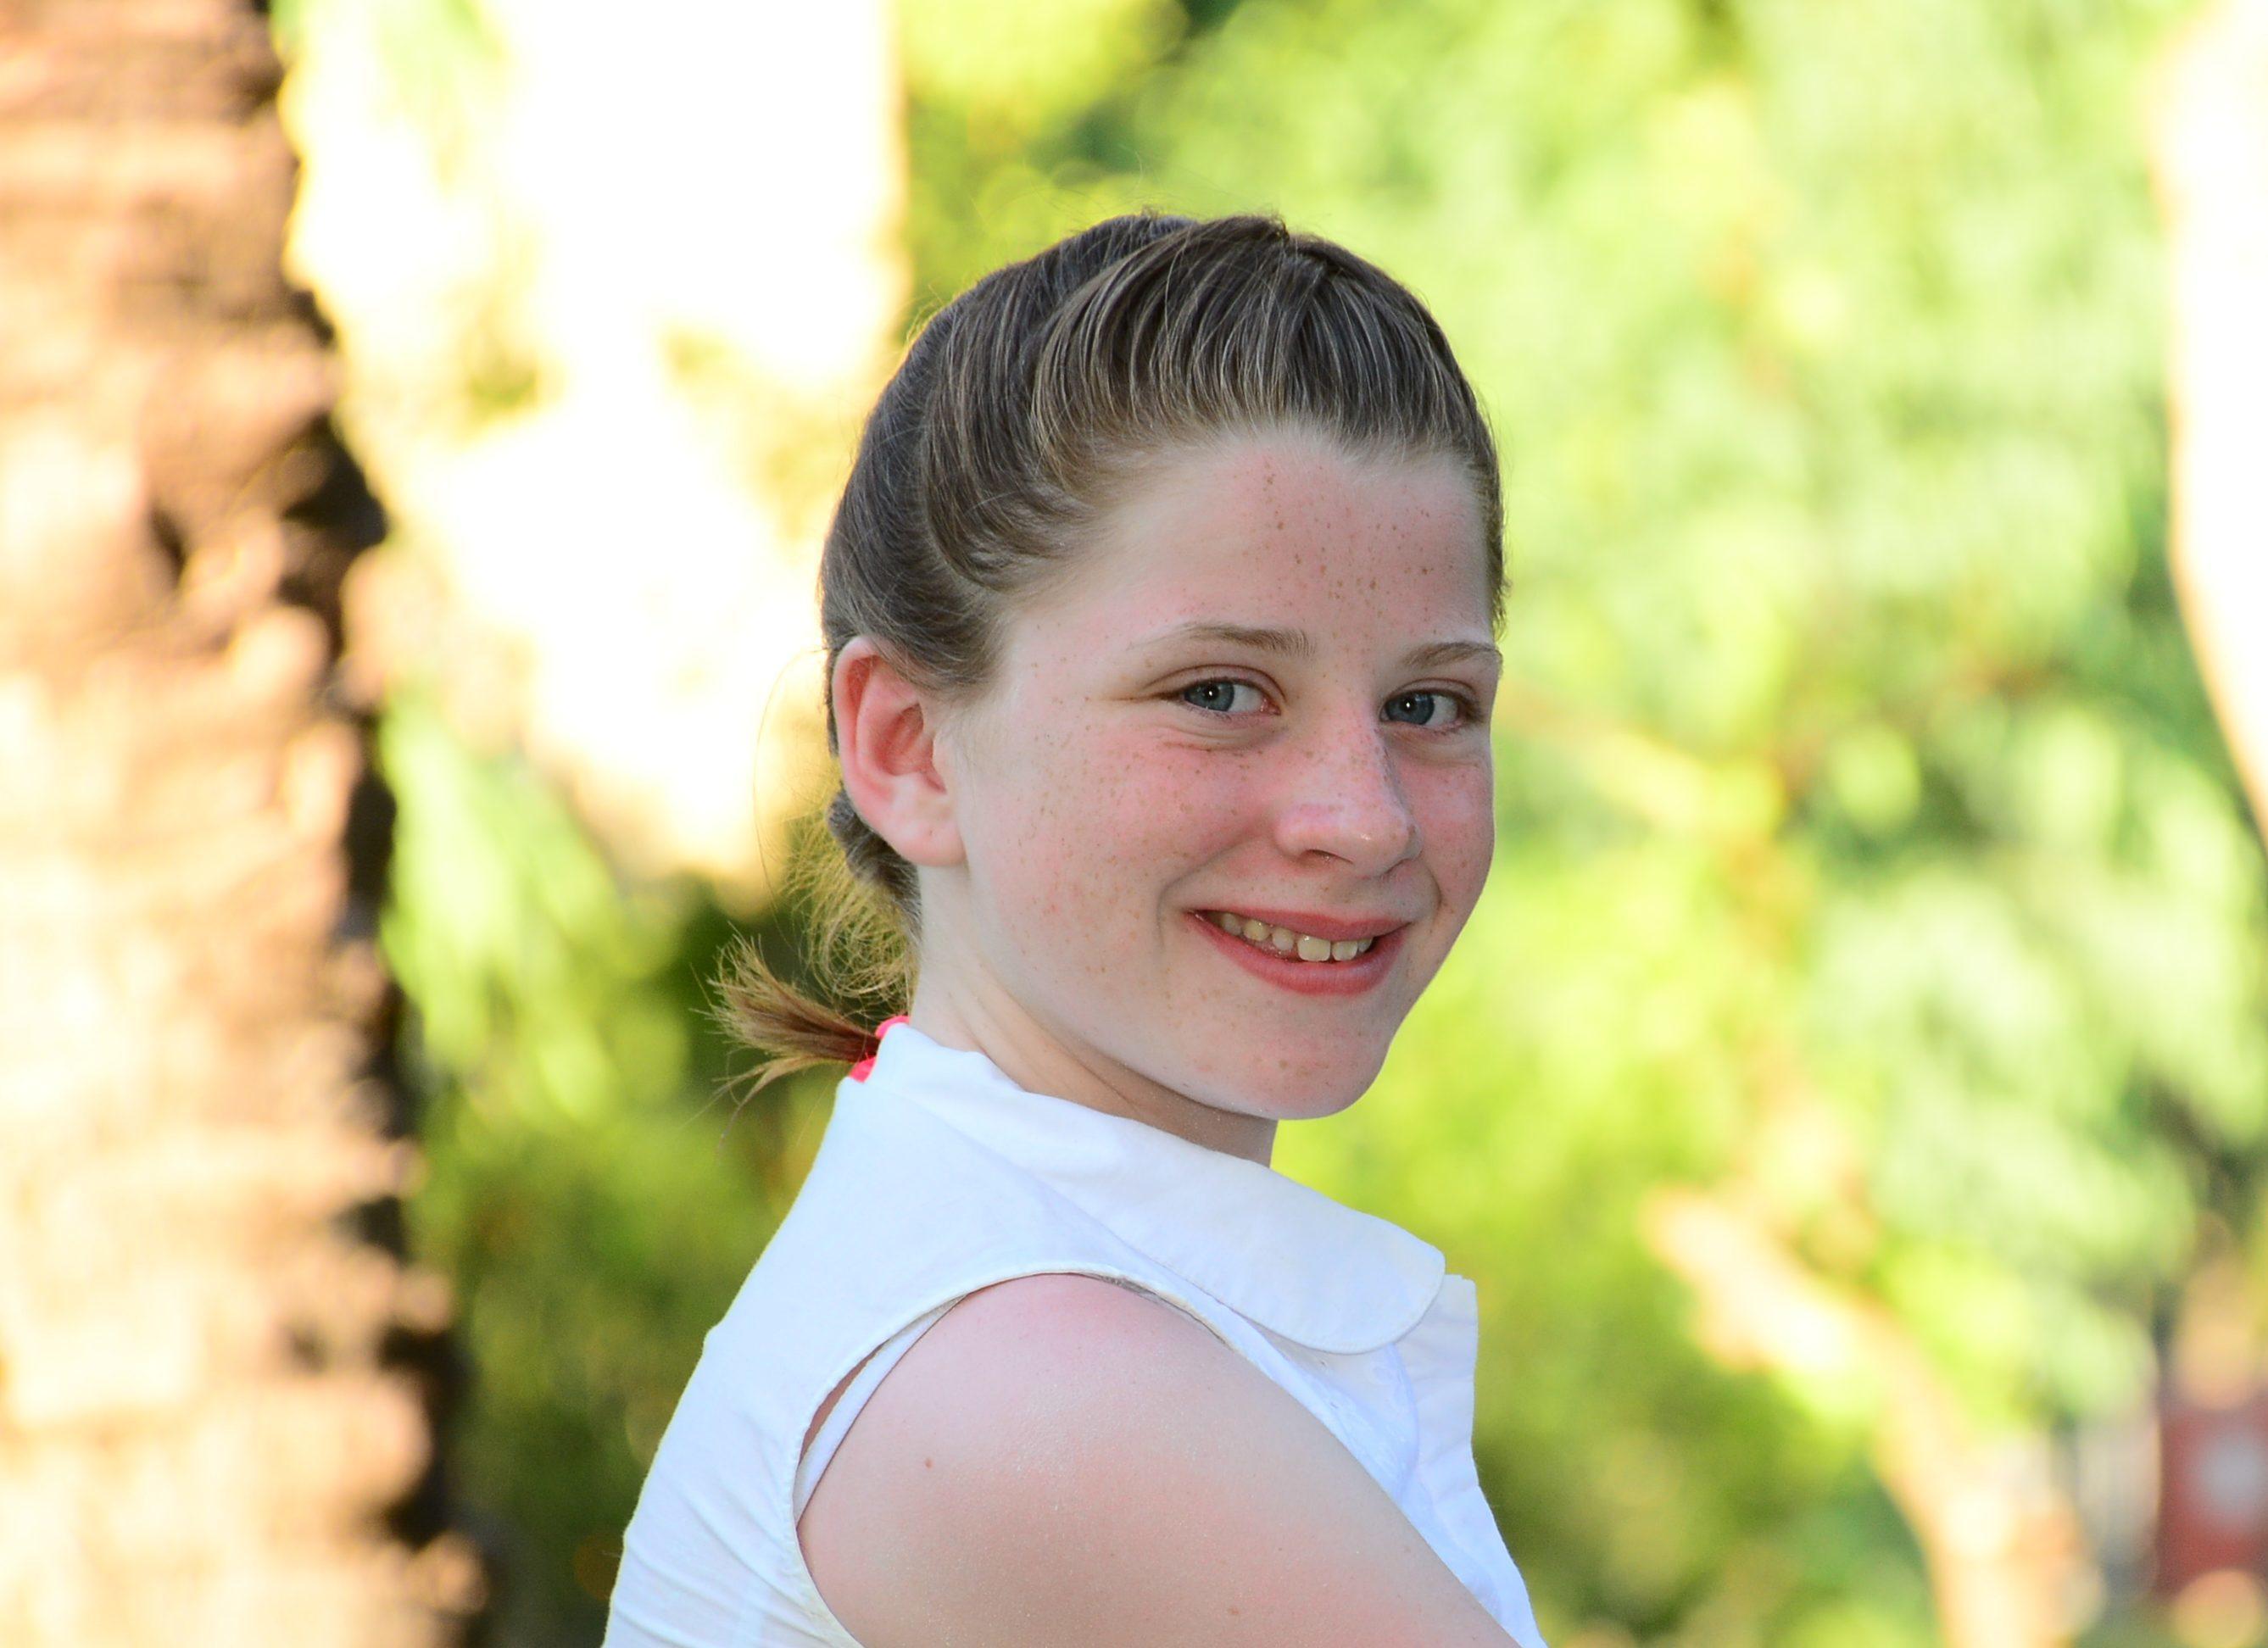 Sadie Merrin